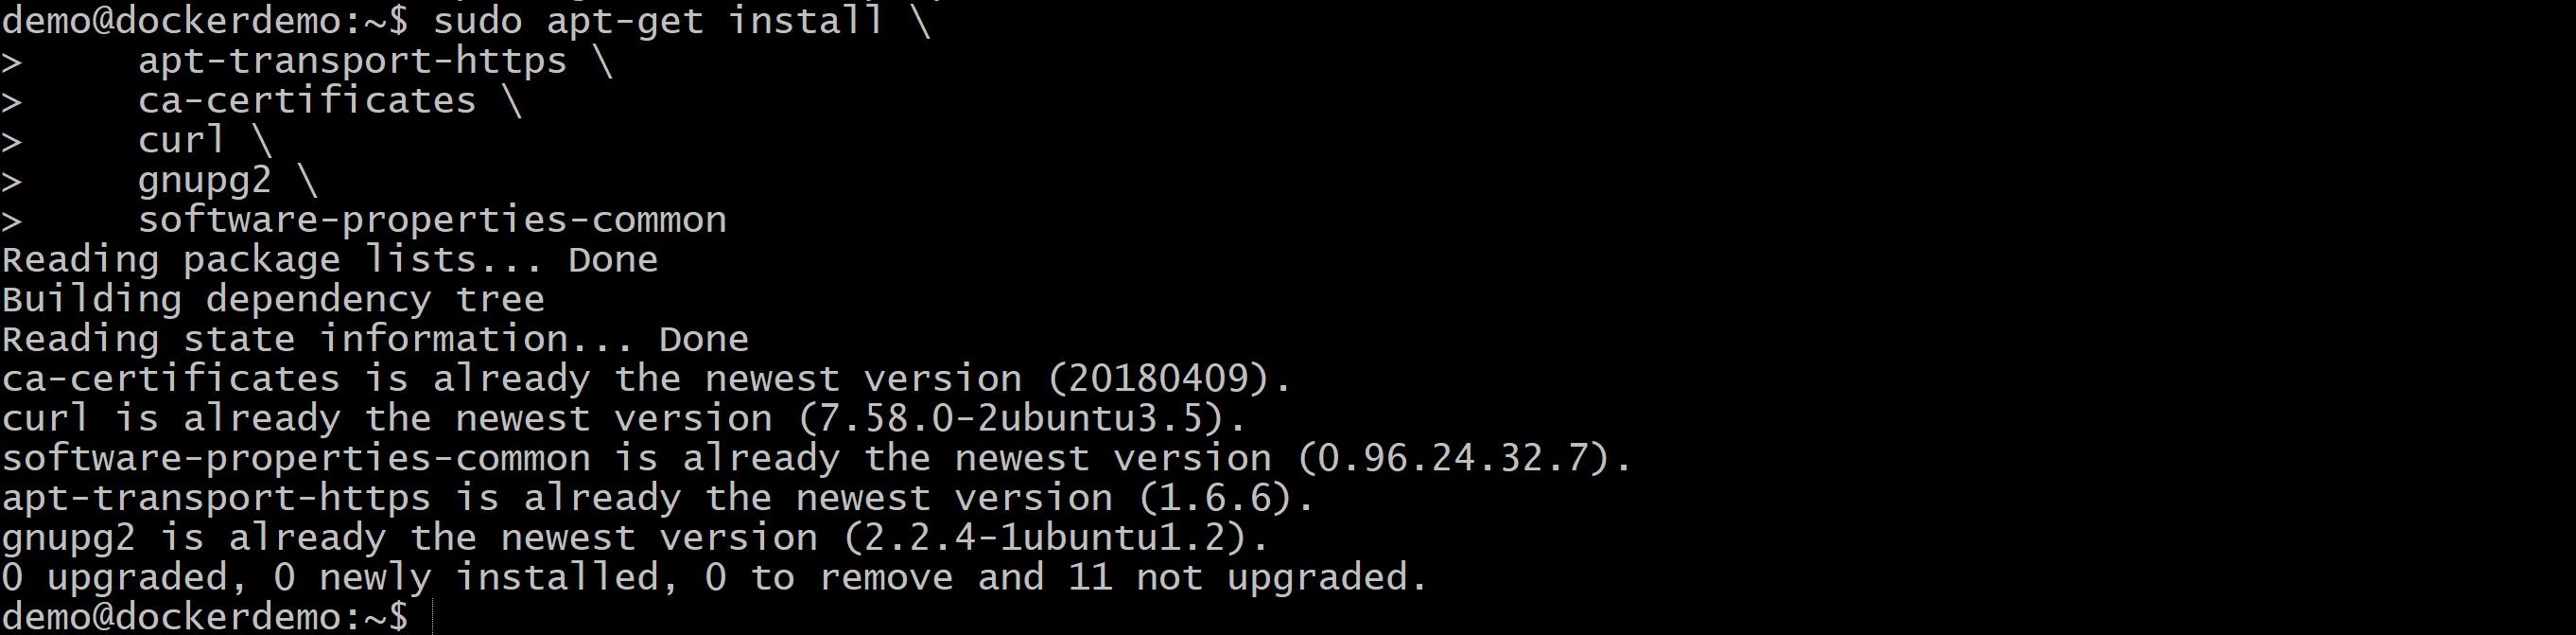 Docker Ubuntu Azure zdj.23